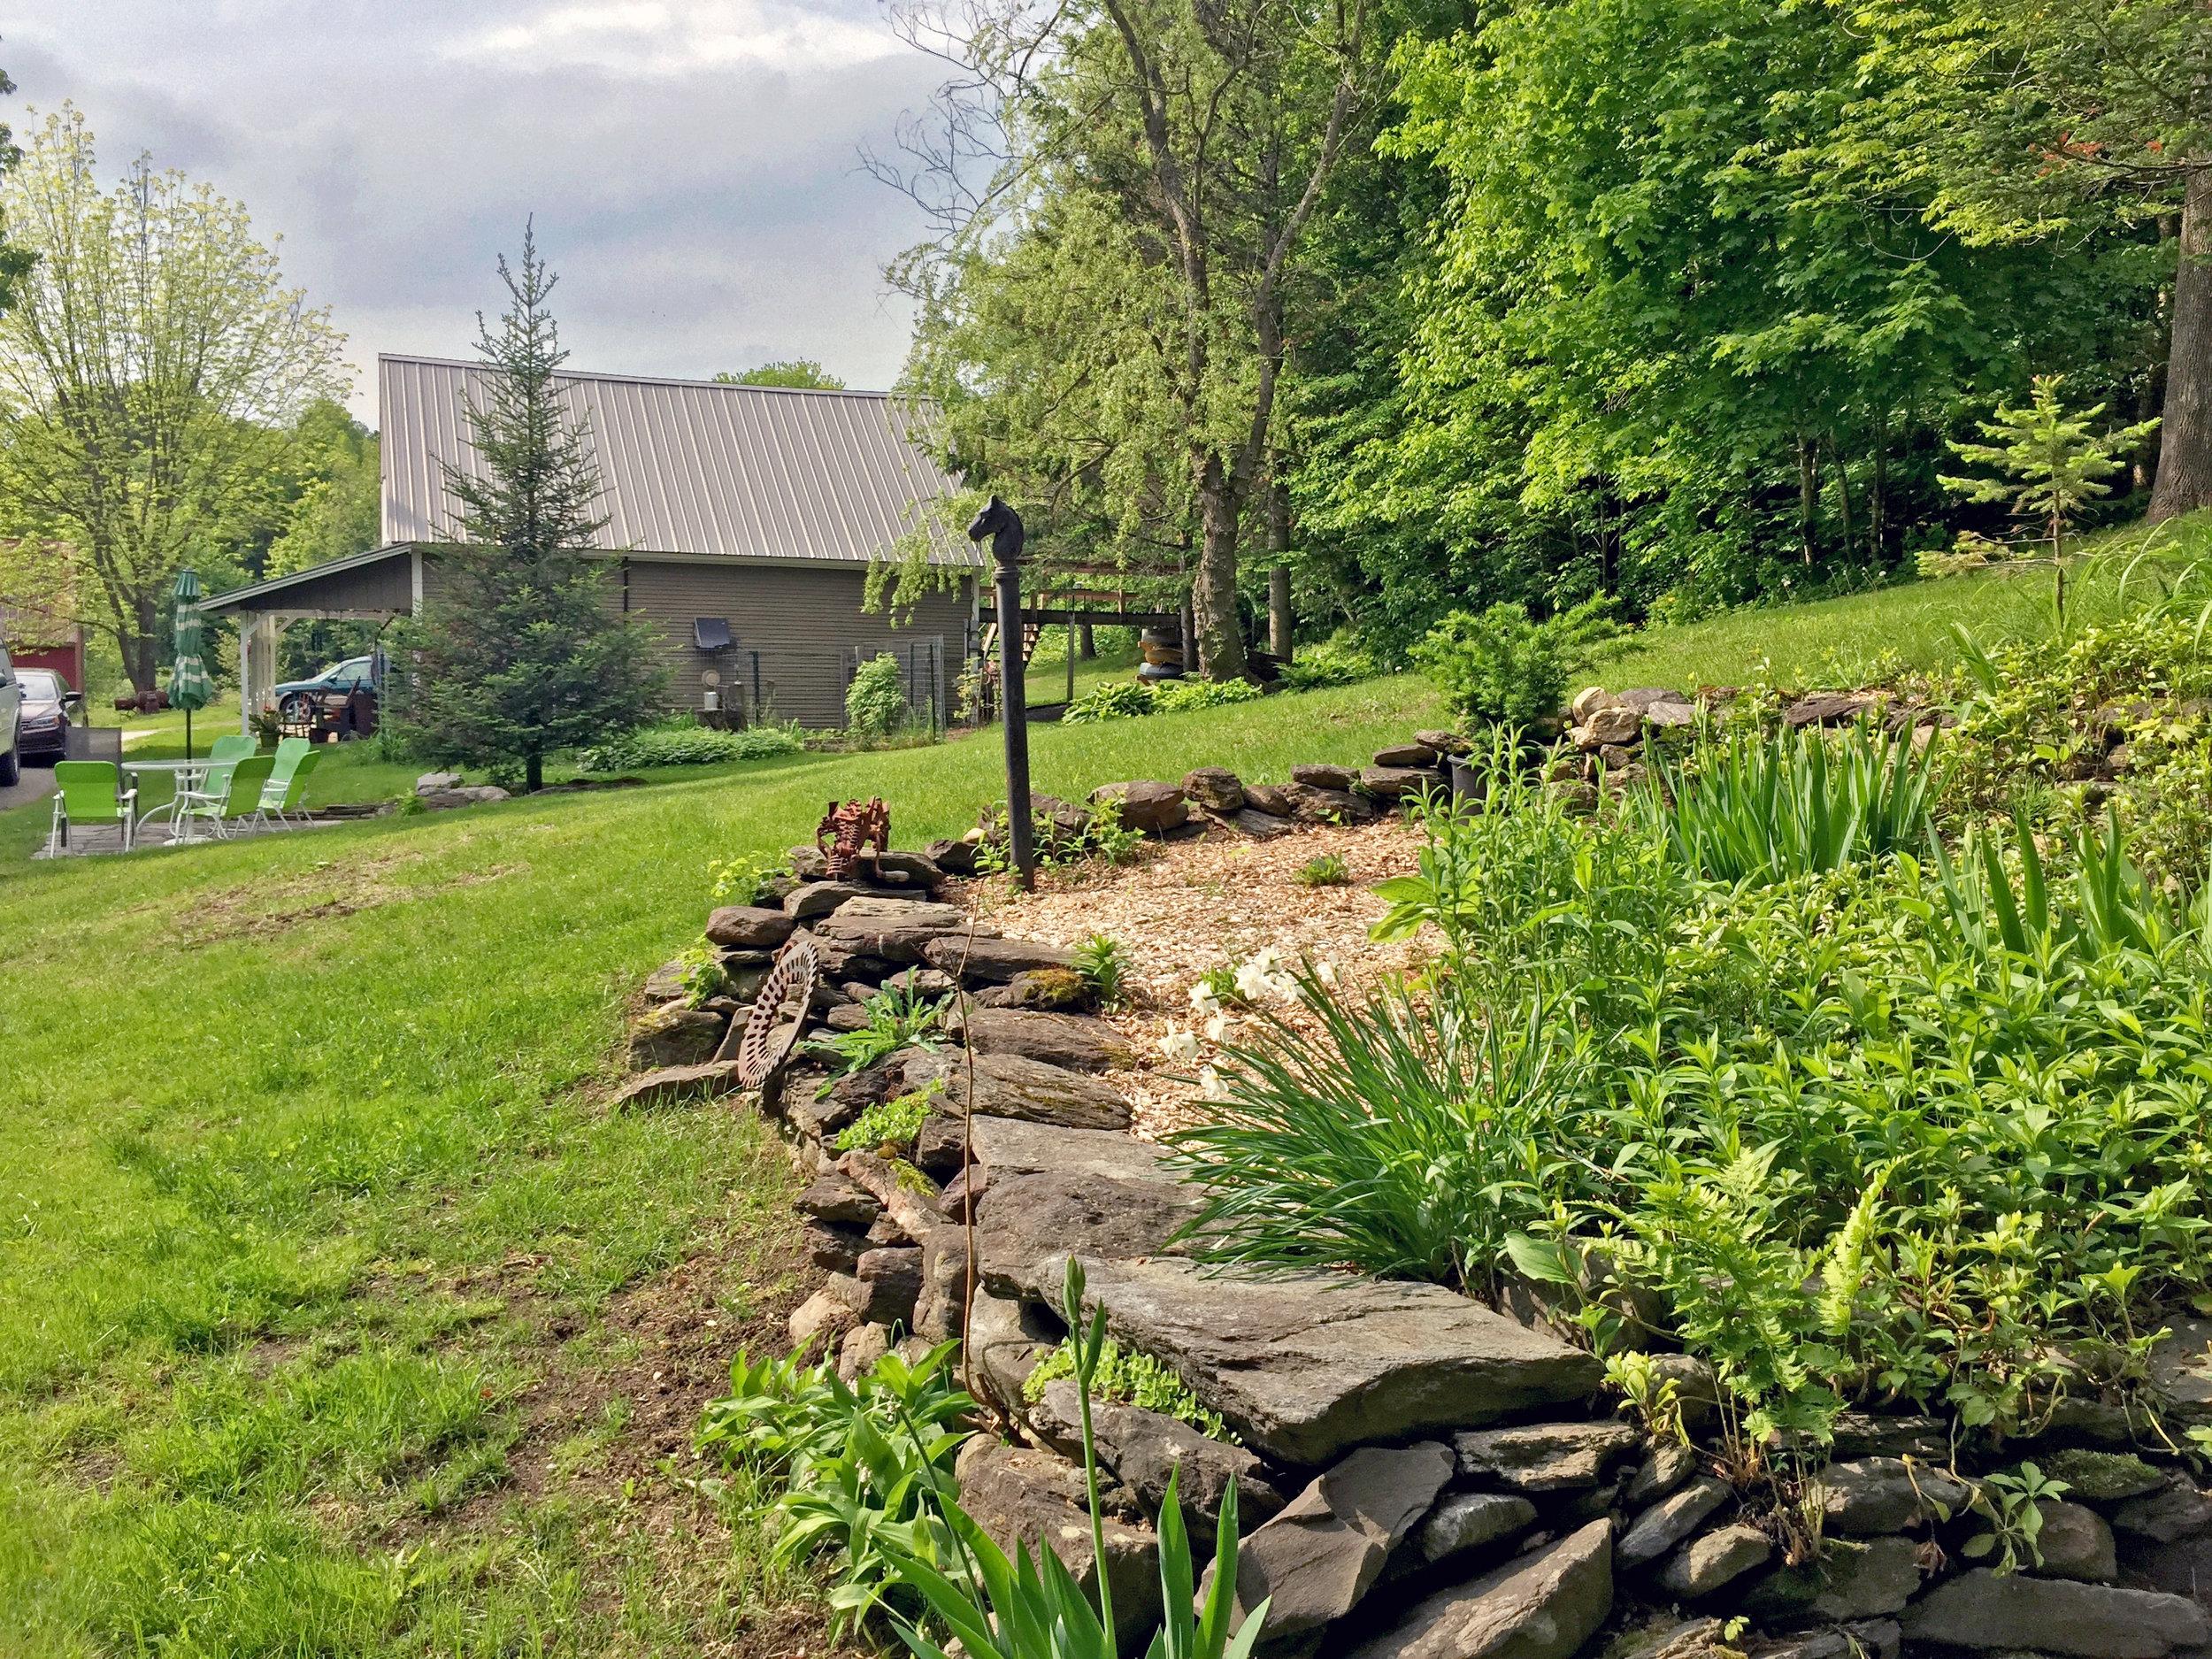 33-2019-06-05 IMG_6603 McGlynchey Garden.jpg